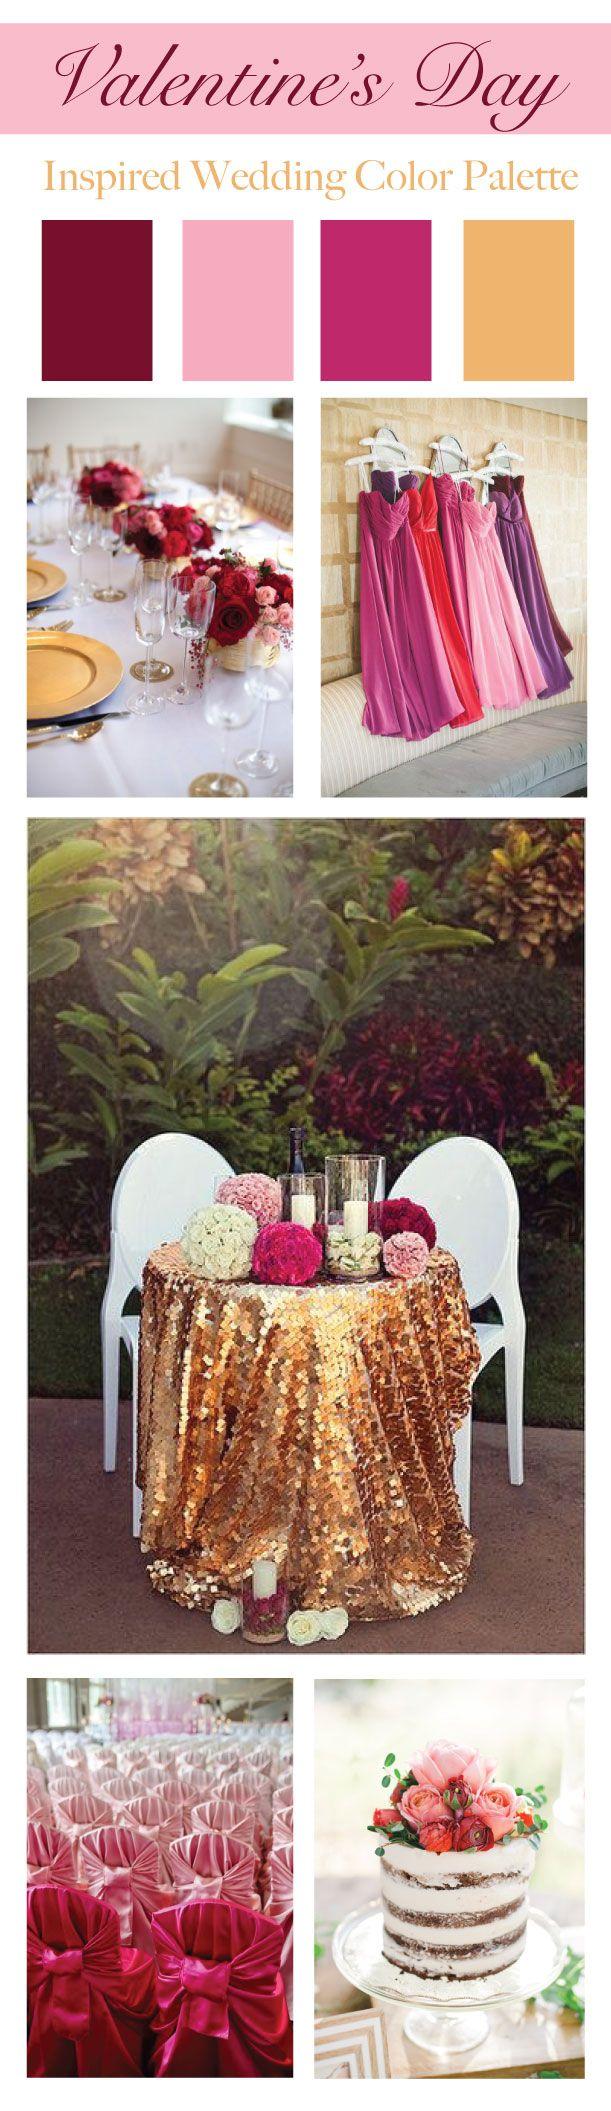 Valentine's Day Inspired Wedding Color Palette | LinenTablecloth Blog #valentine's #colorpalette #wedding